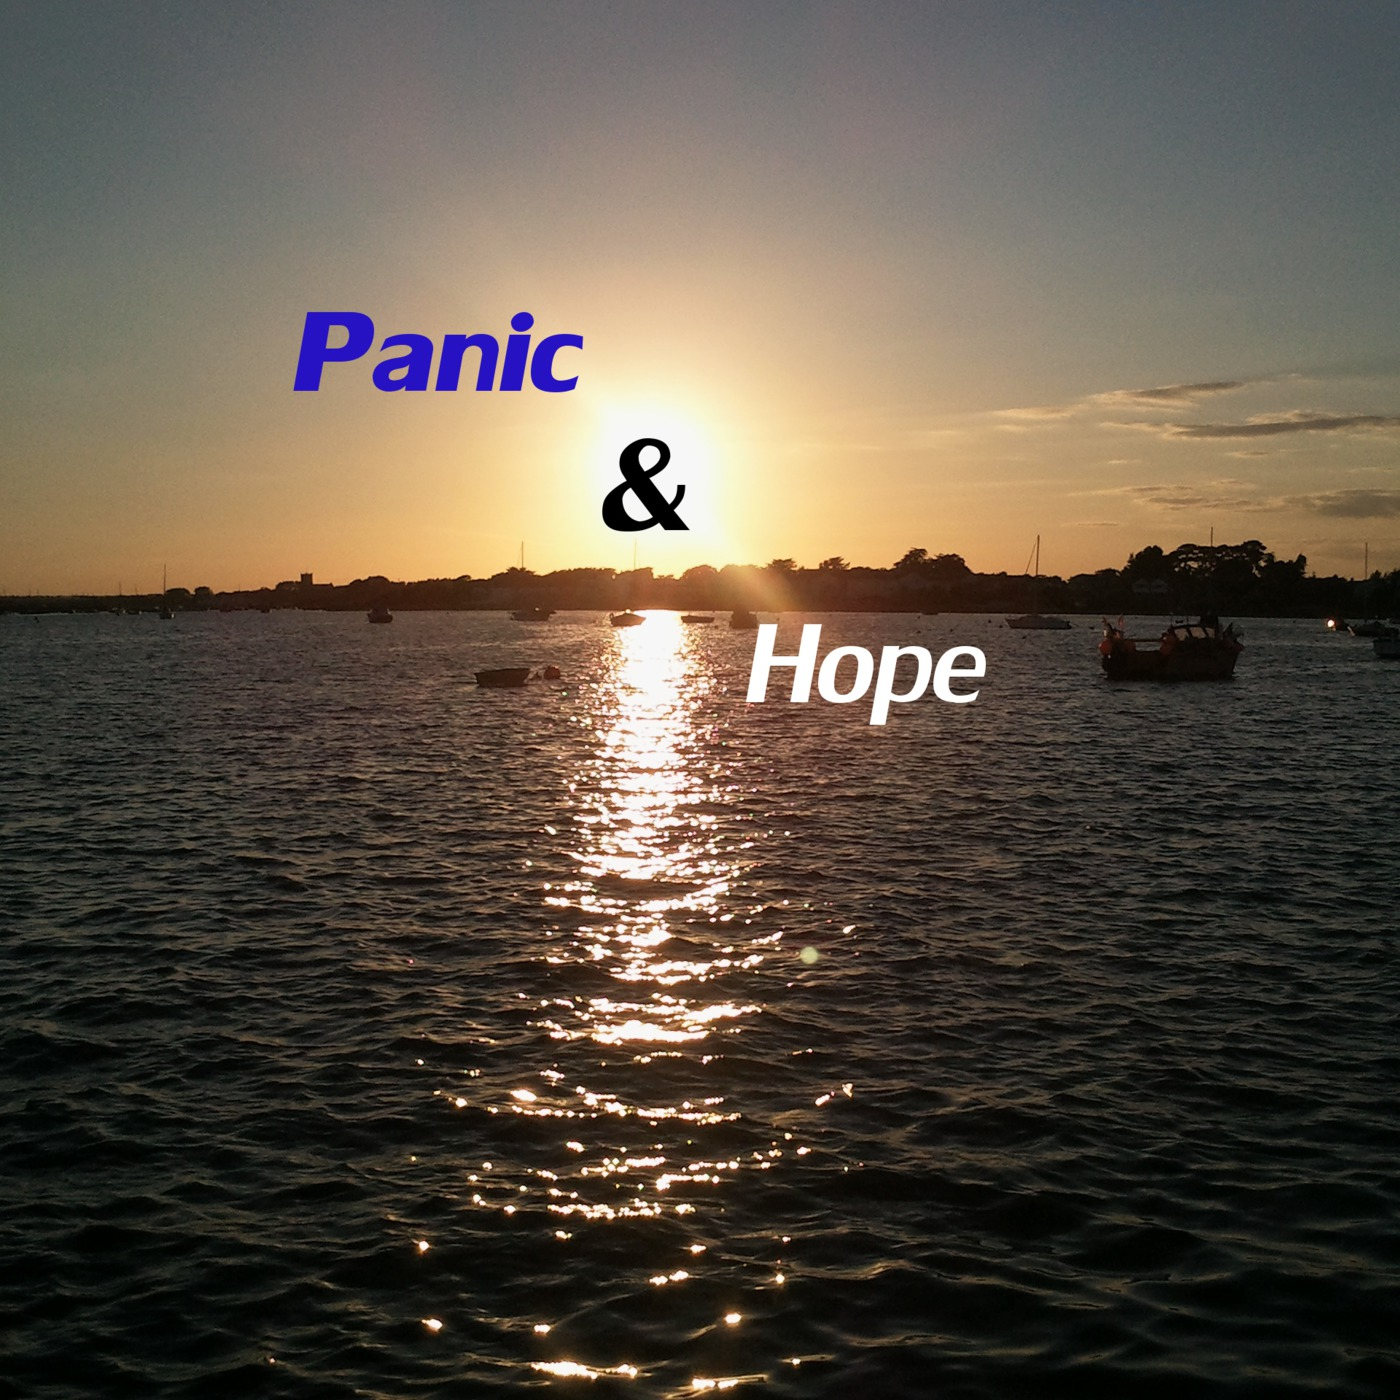 Panic and Hope